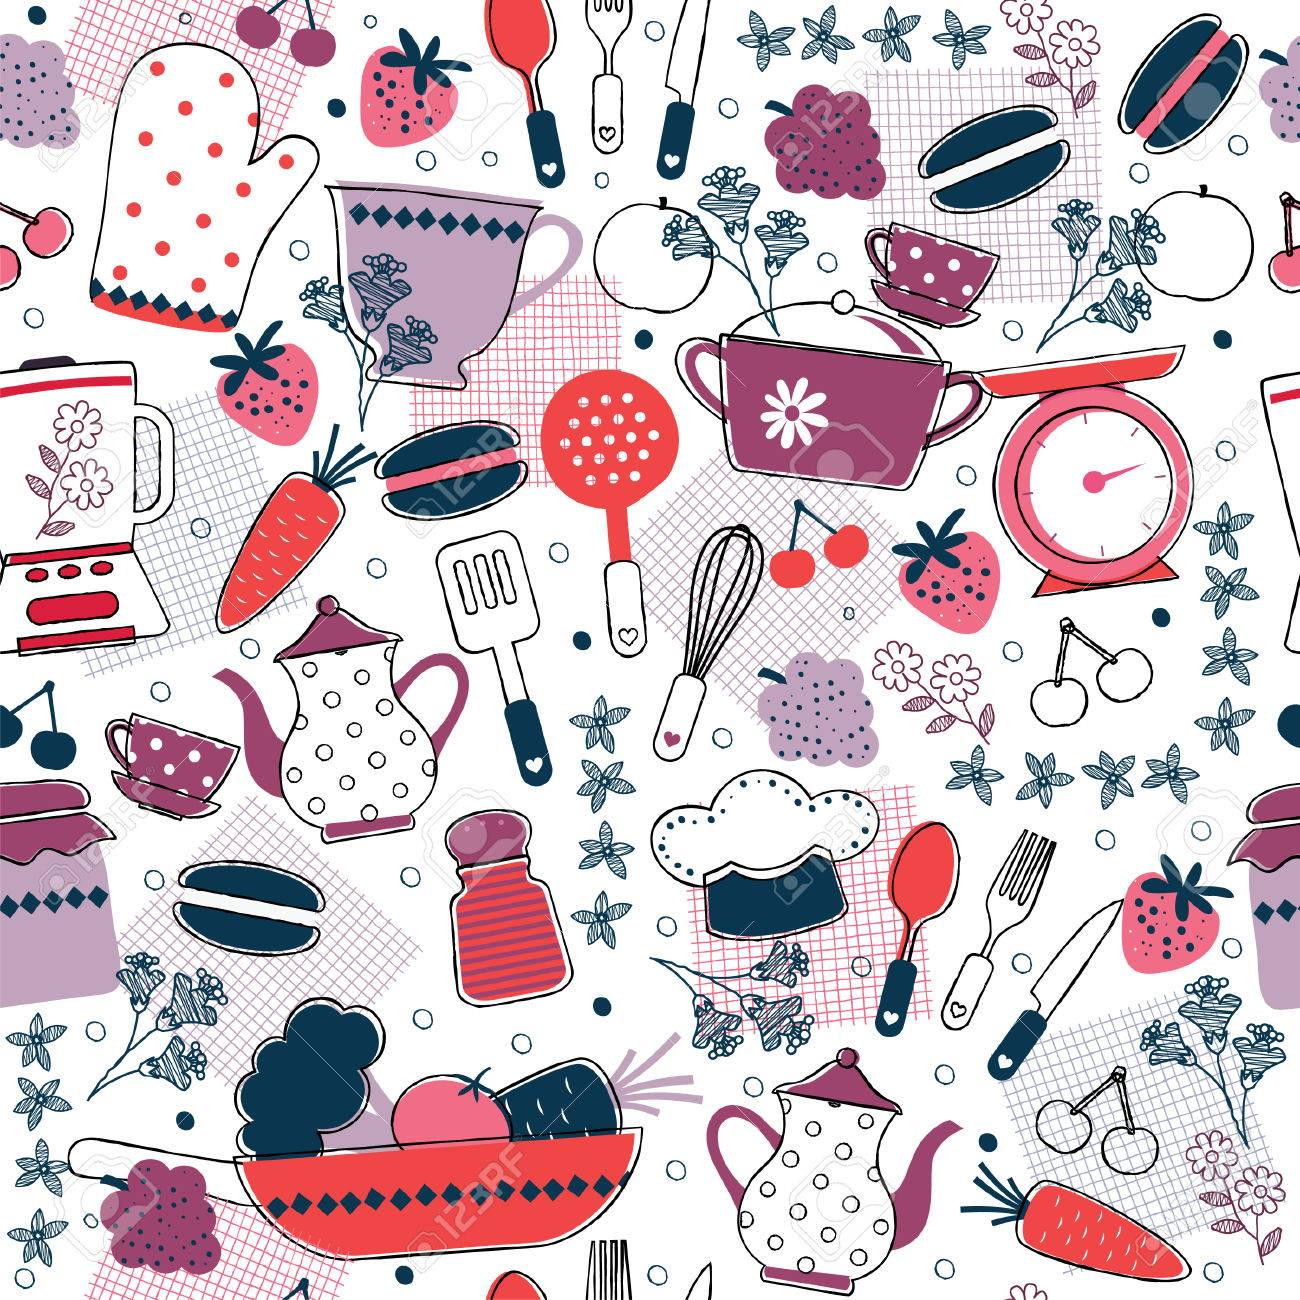 Seamless Kitchen Wallpaper Design Stock Vector   33301911